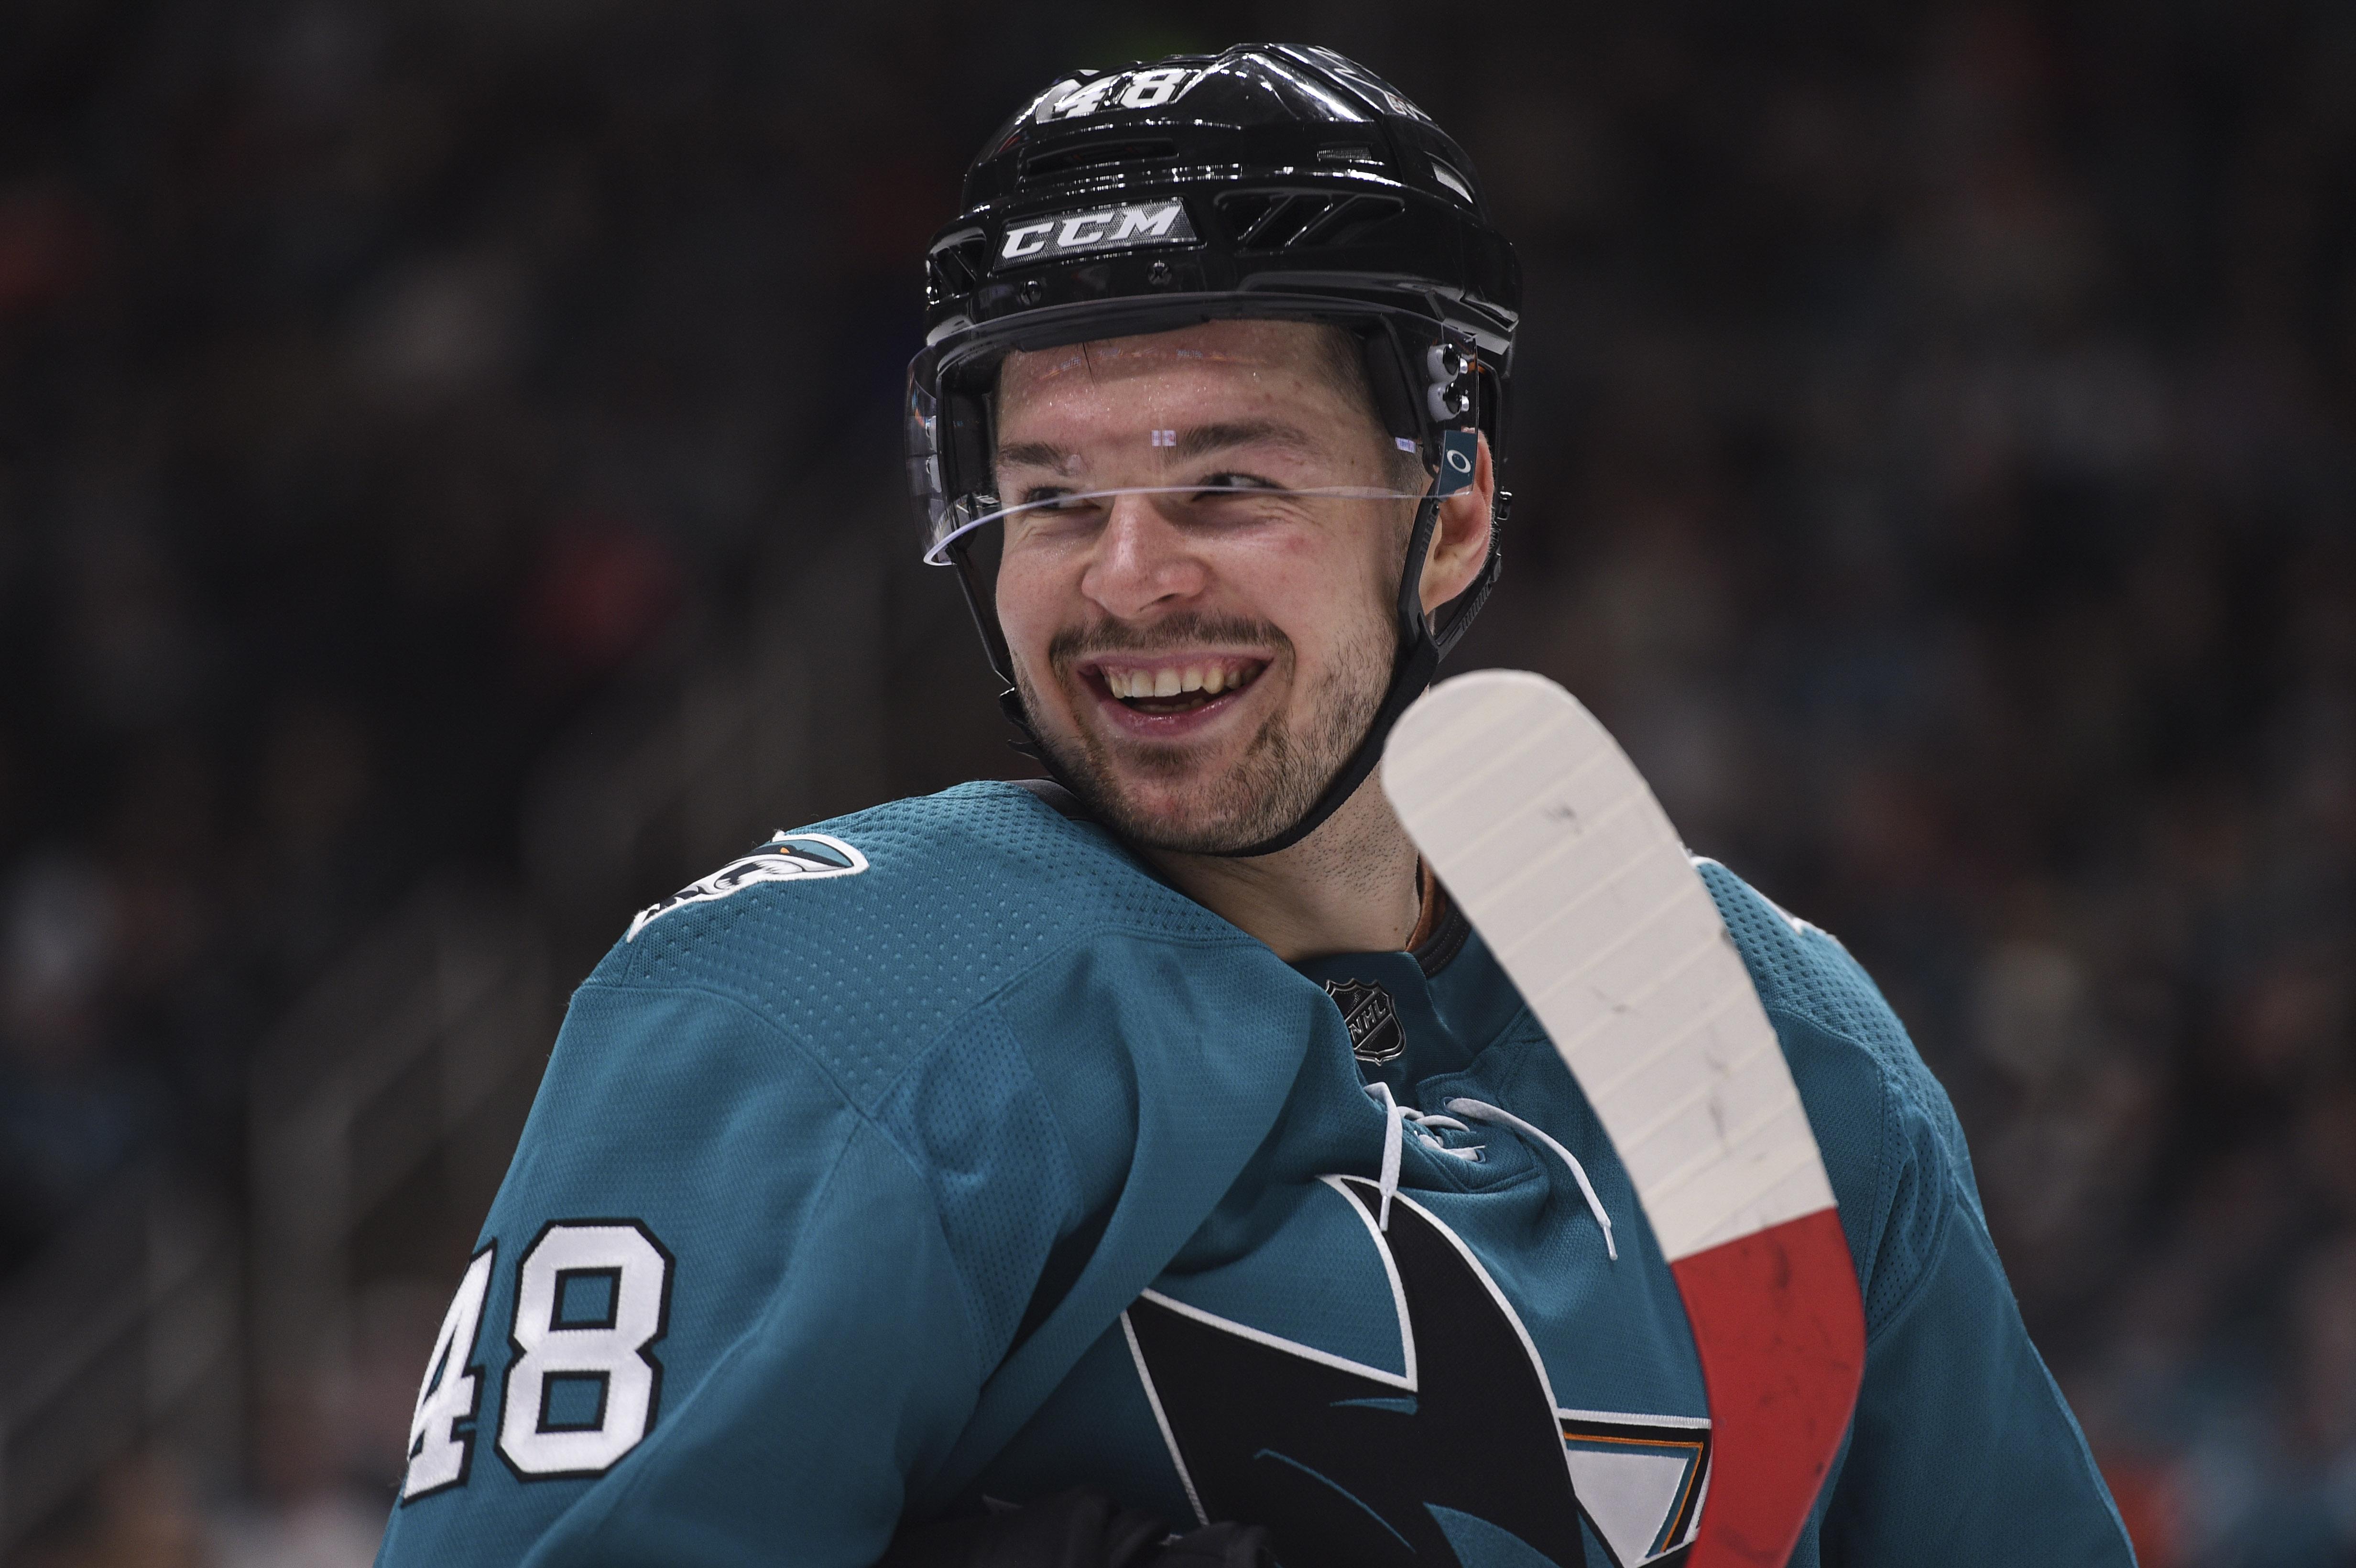 Dec 28, 2019; San Jose, California, USA; San Jose Sharks center Tomas Hertl (48) during the third period against the Philadelphia Flyers at SAP Center in San Jose